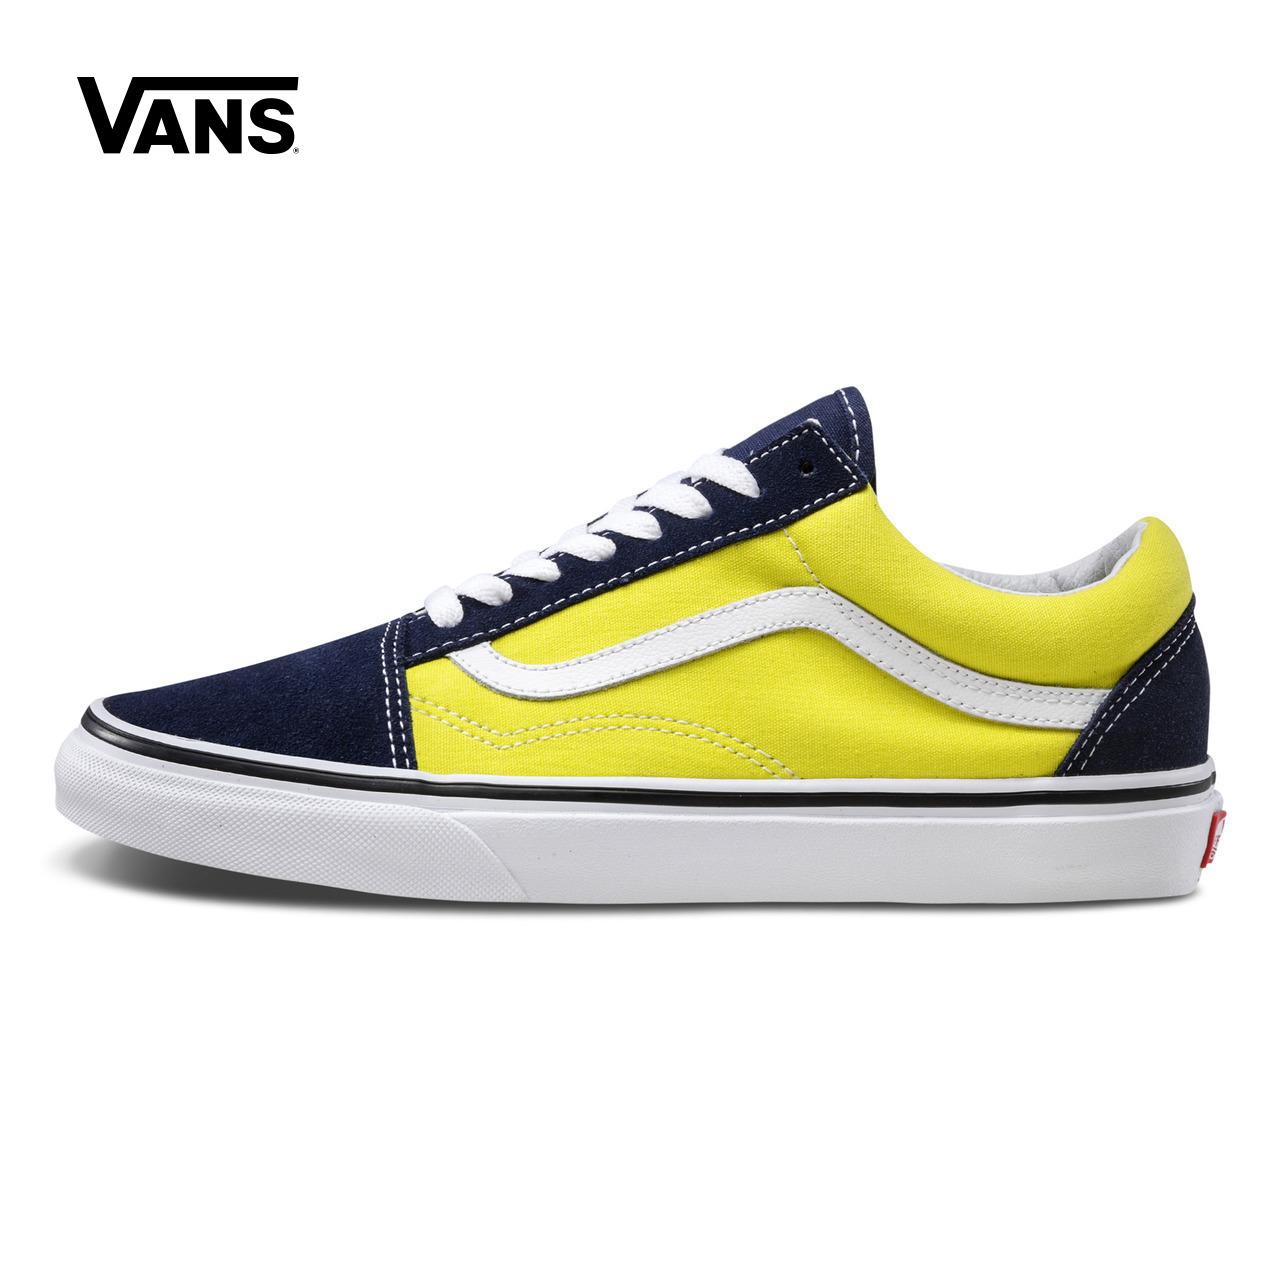 Vans 范斯官方男女款OLD SKOOL板鞋|VN0A38G1R1M